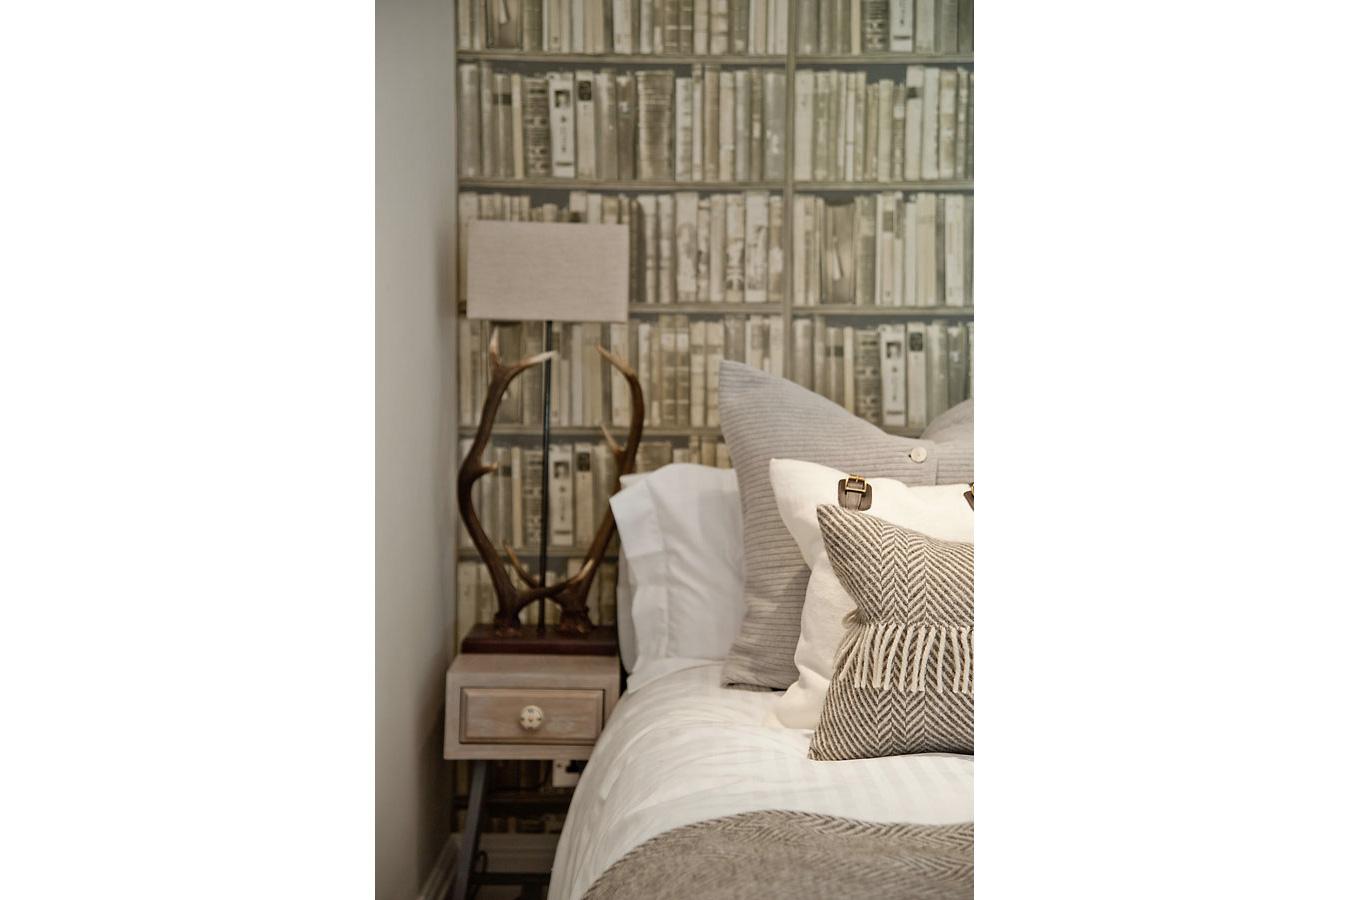 Design Box London - Interior Design - Chelsea Studio, SW3 - Bedroom